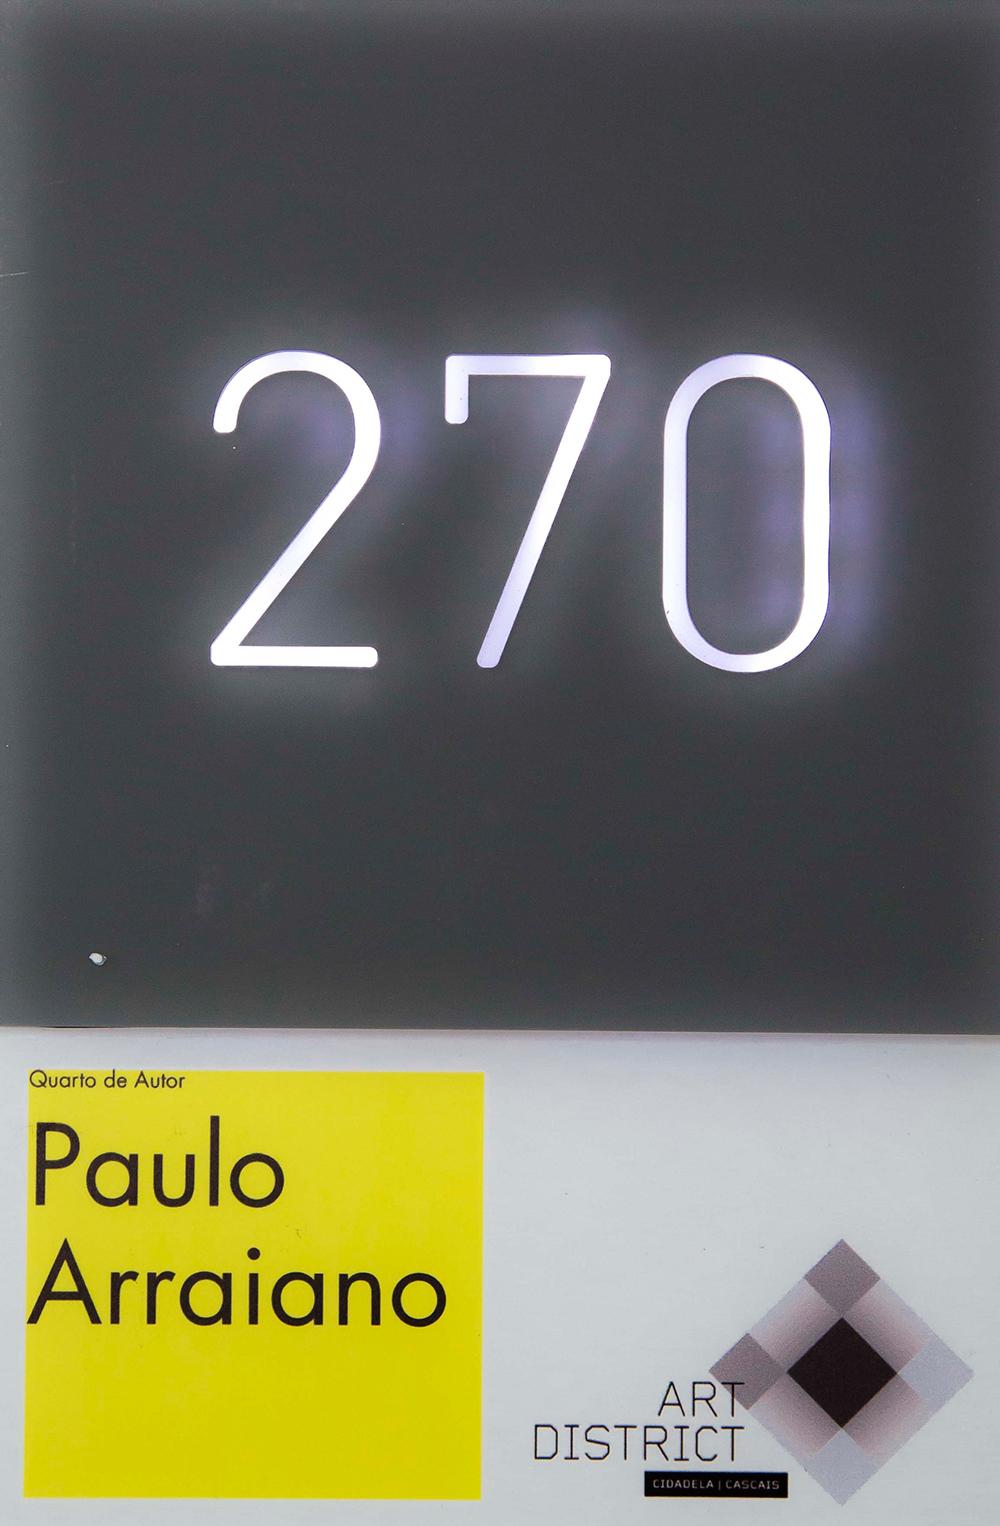 Pousada-Takeover---Quarto-270---Paulo-Arraiano.jpg